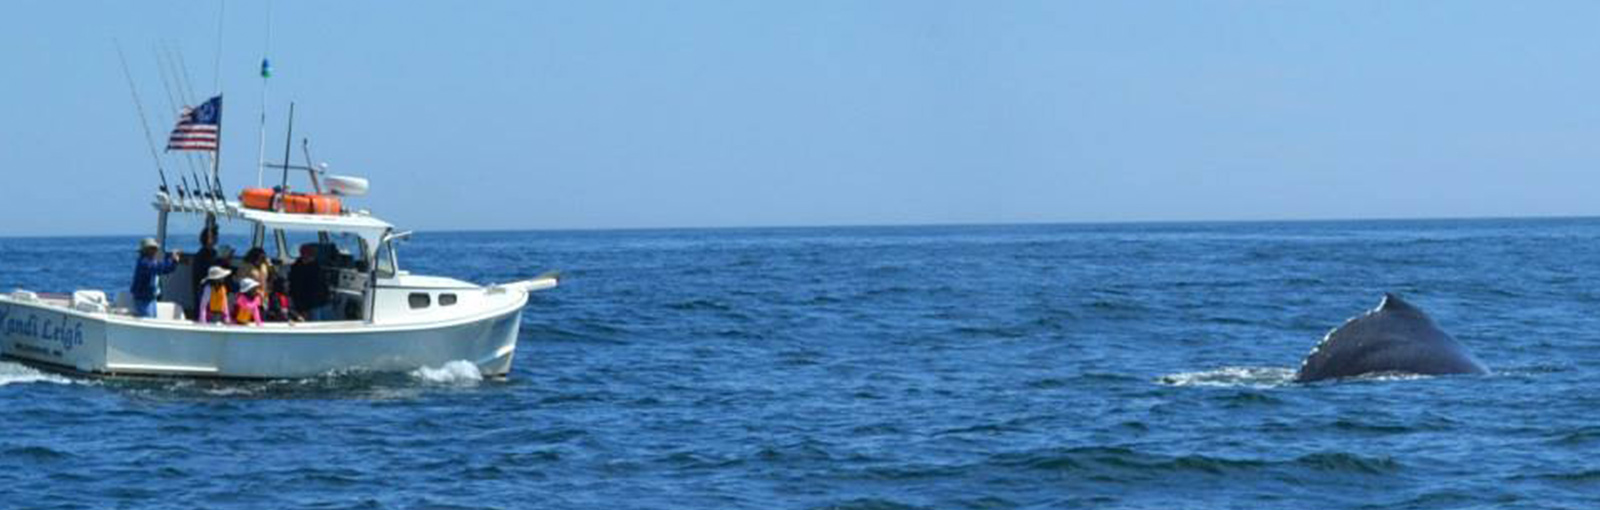 Robertson Sea Tours